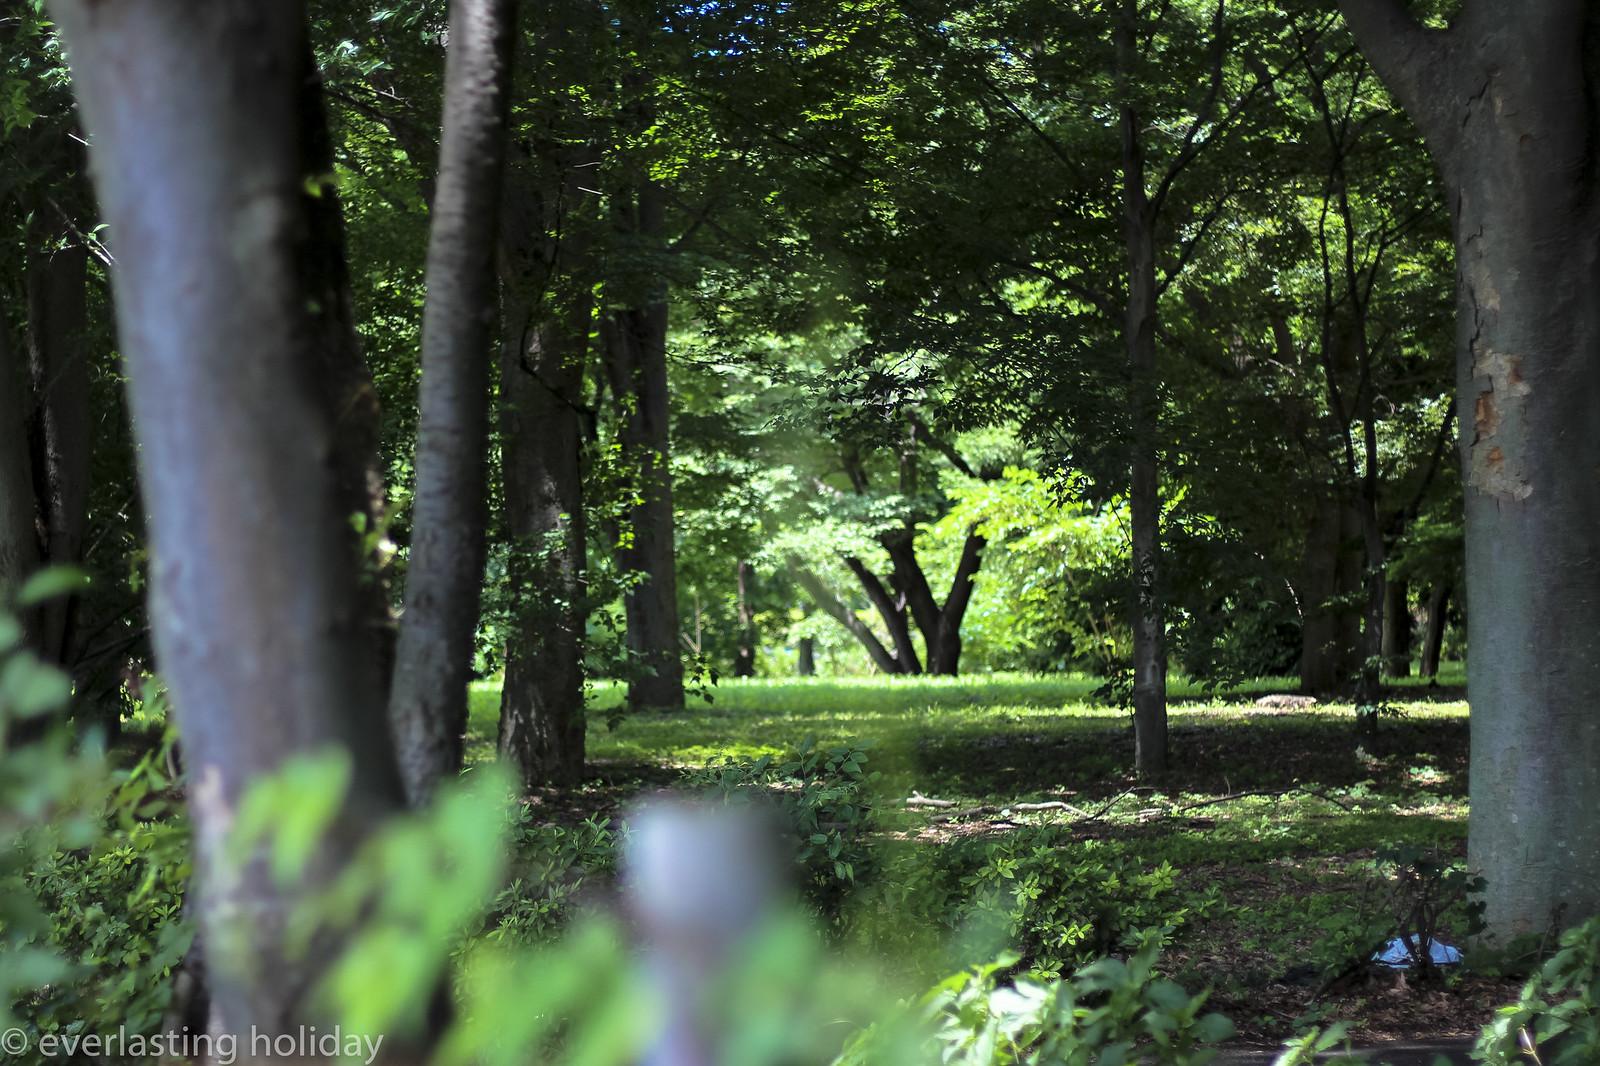 小金井公園 Koganei Park-0001